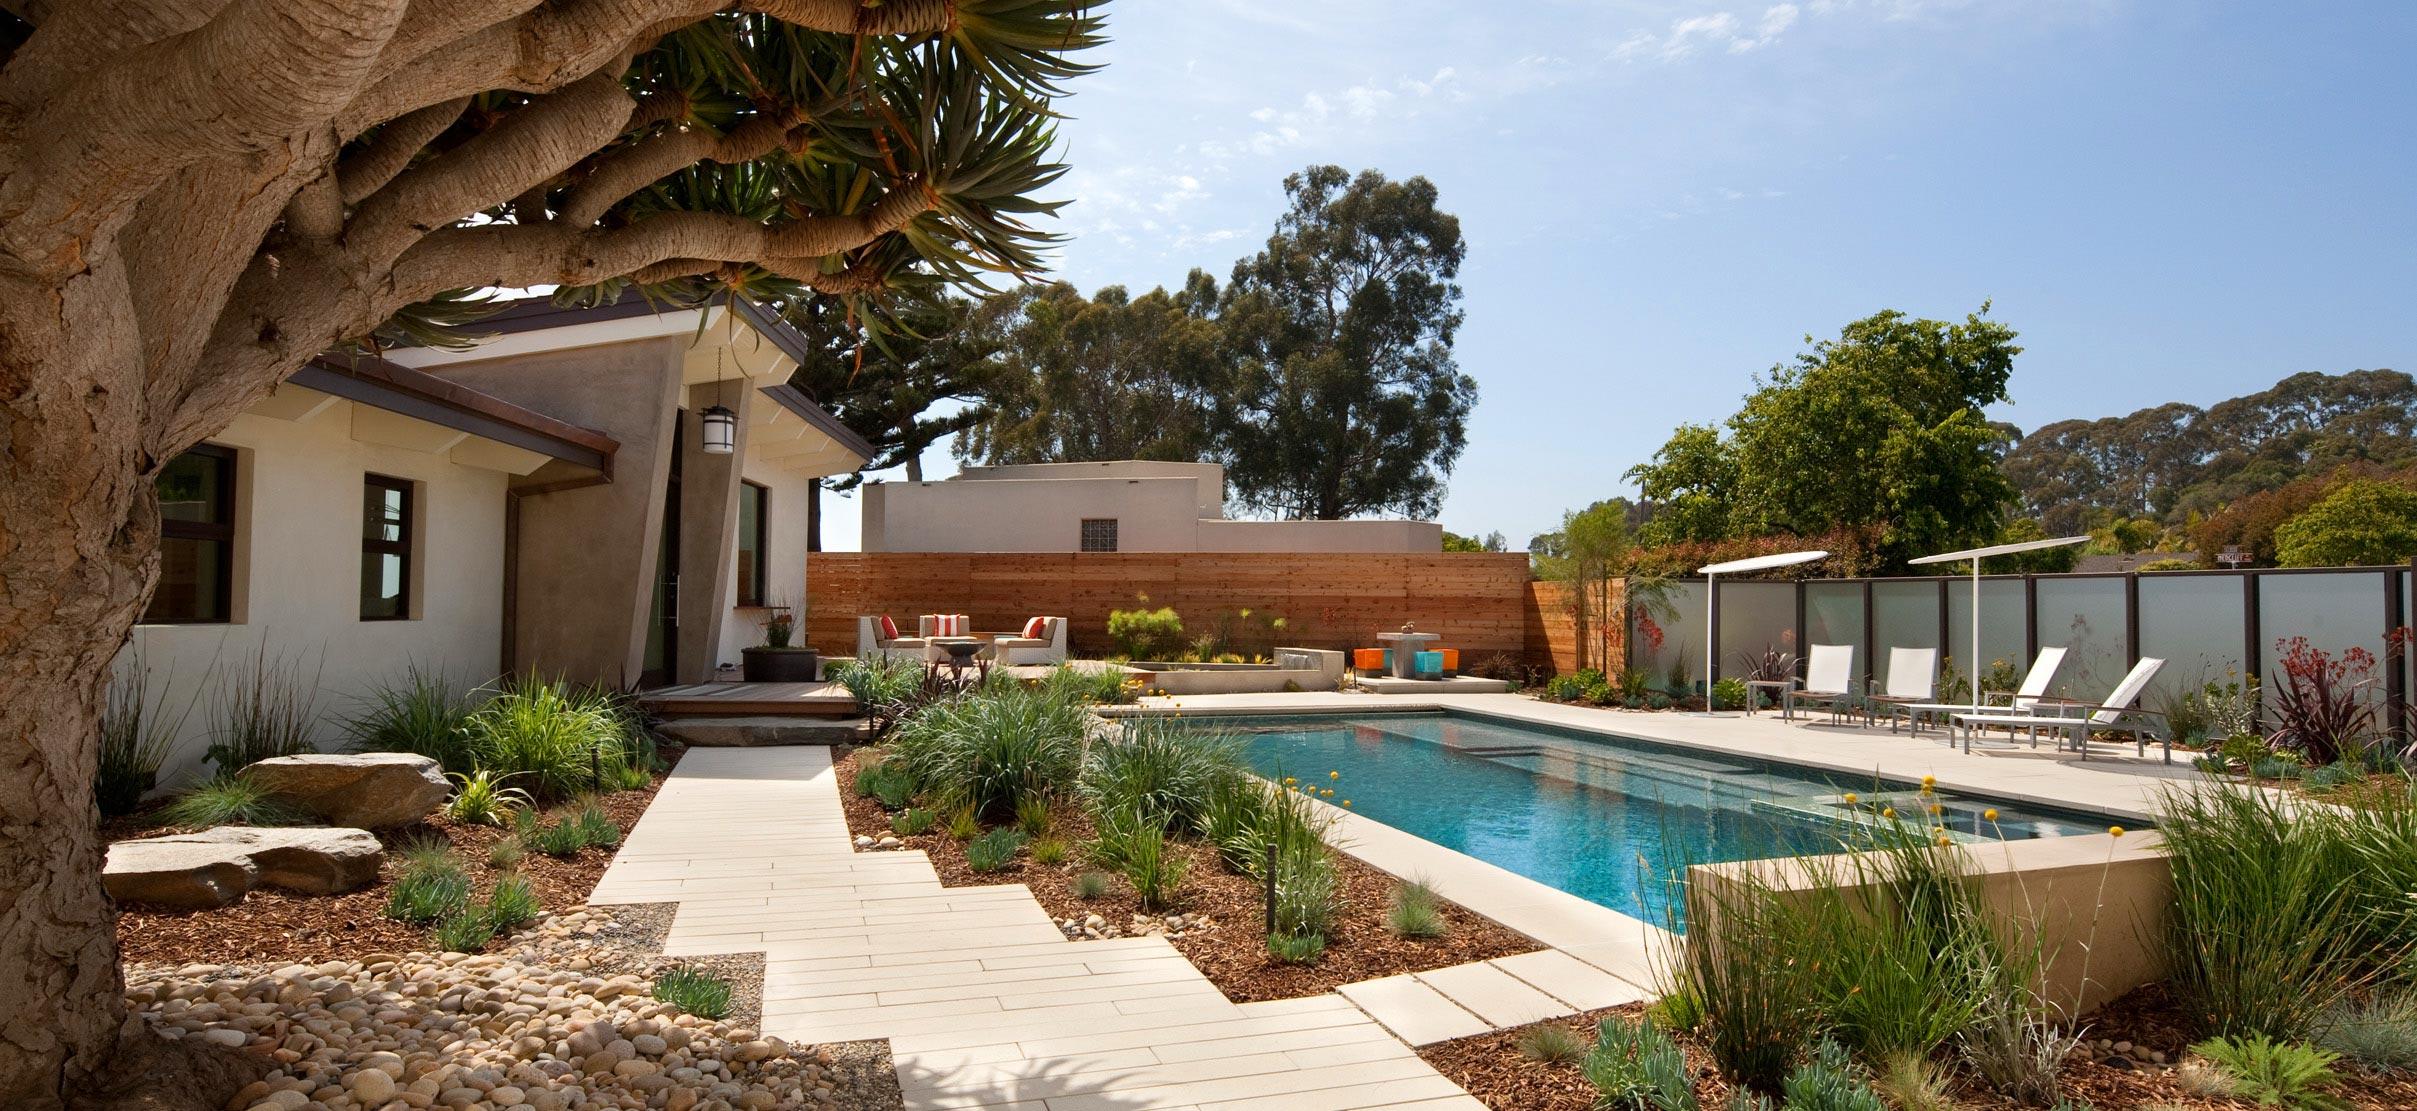 1-pool-concrete-pavers.jpg